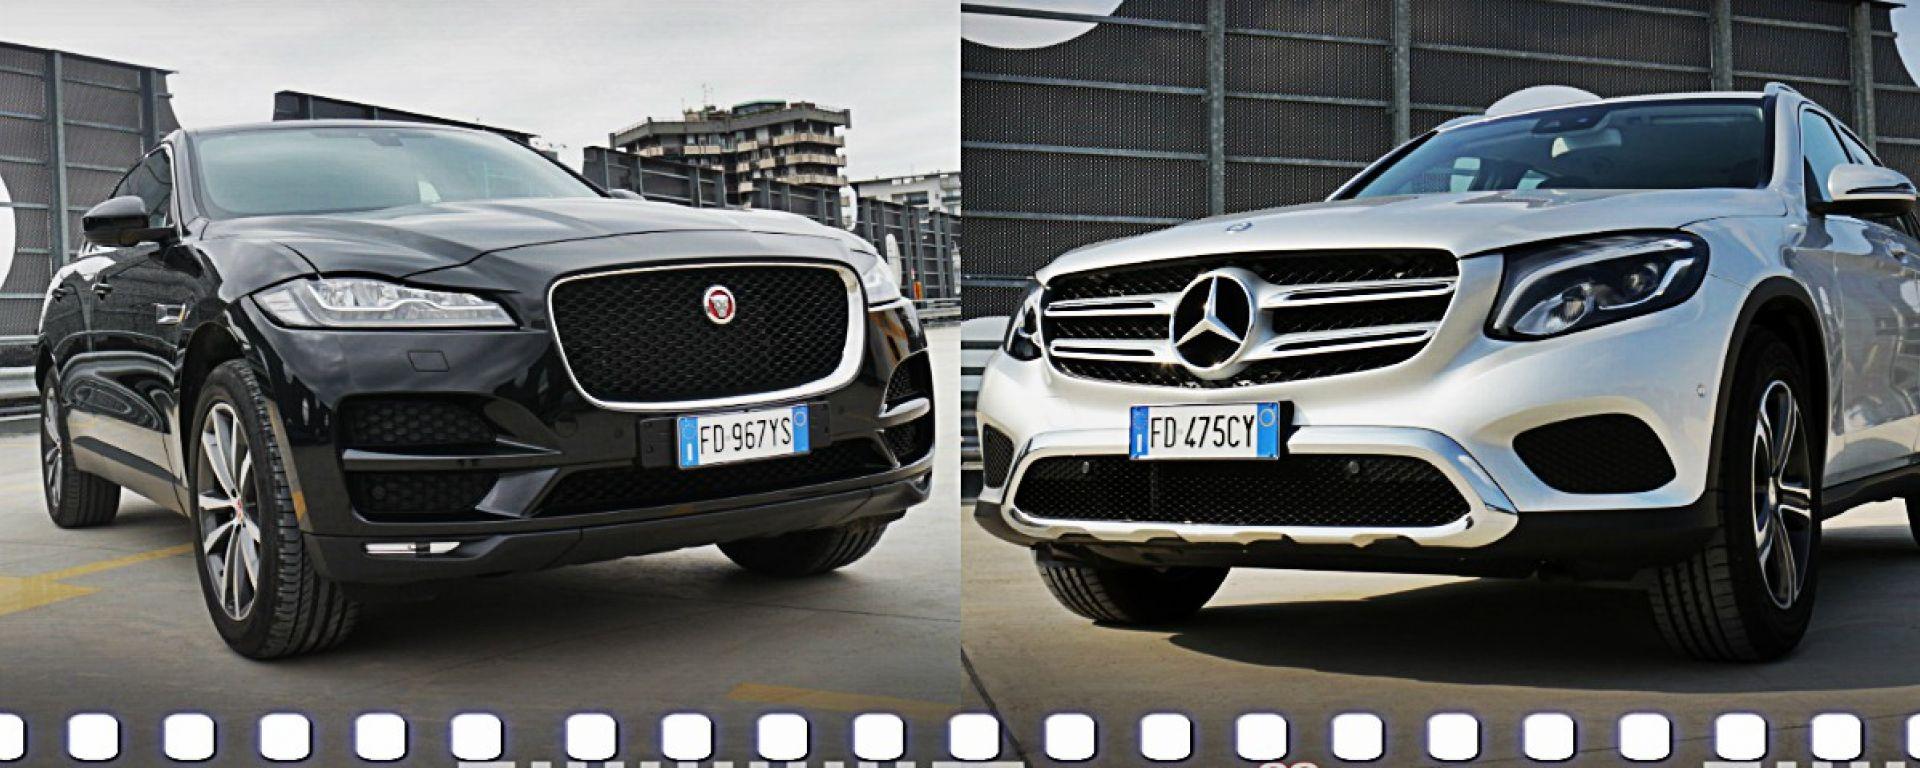 Jaguar F-Pace vs Mercedes GLC. Guarda il video